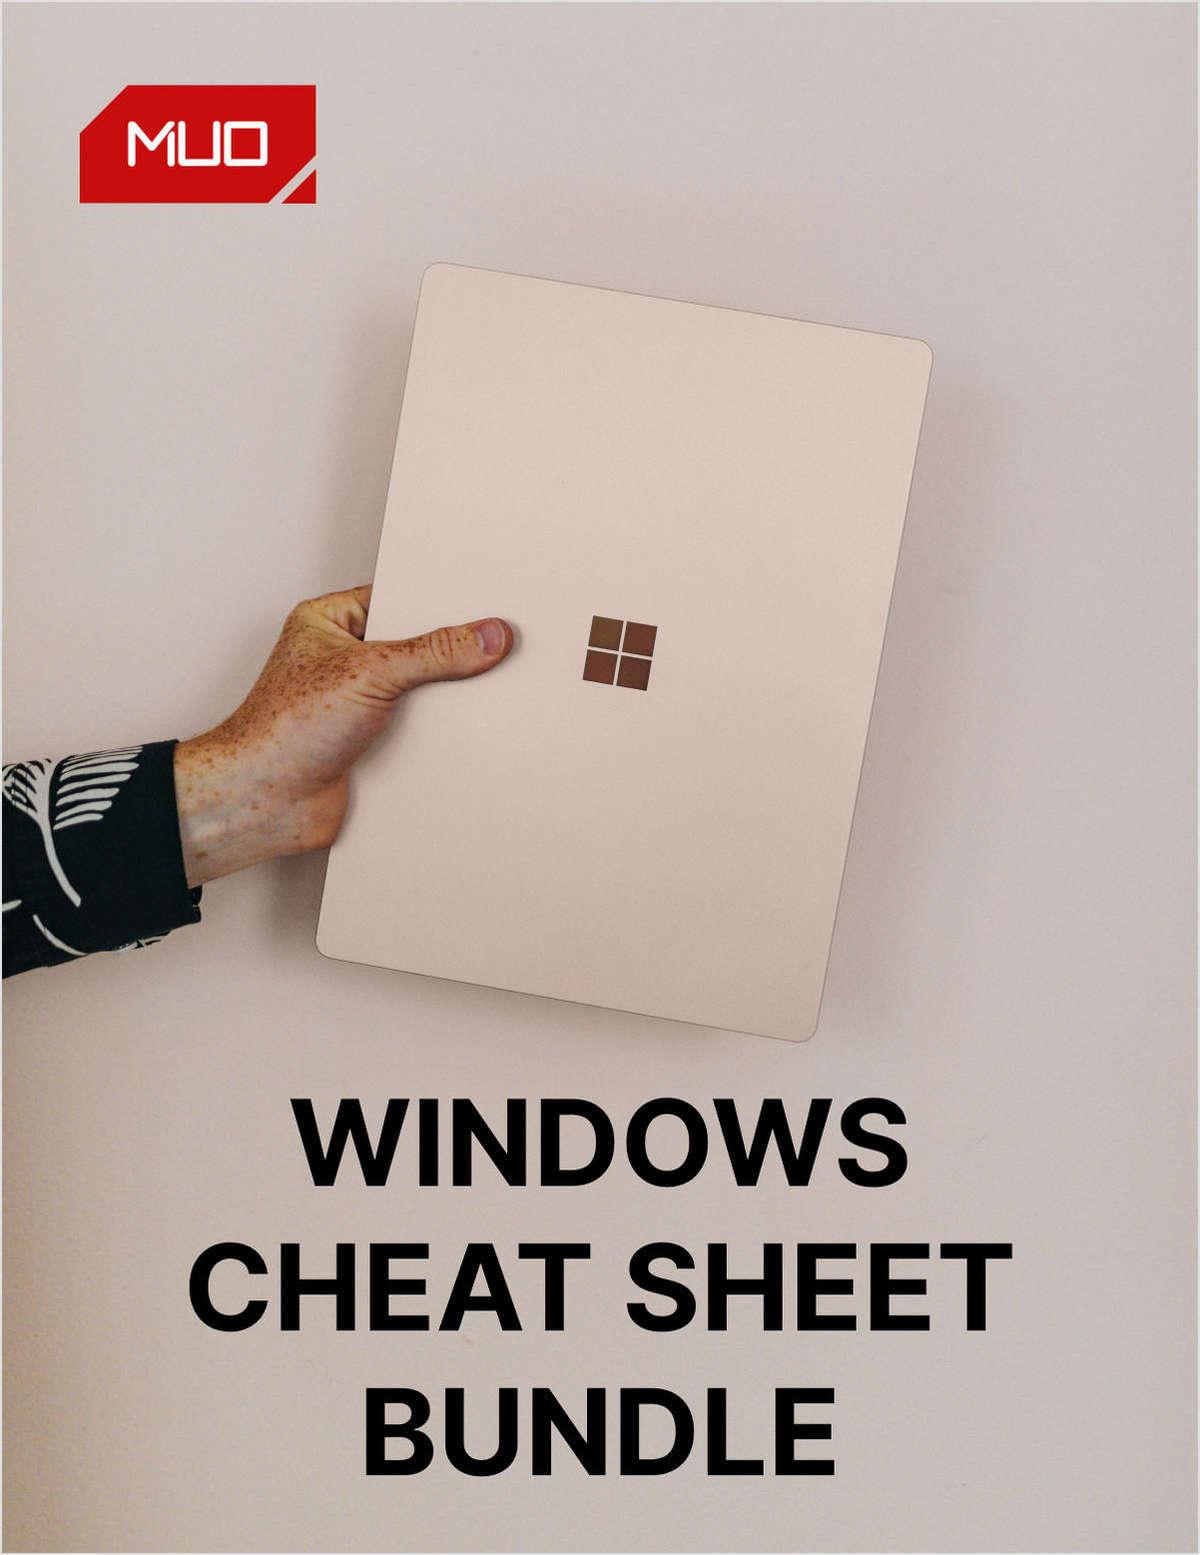 Windows Cheat Sheet Bundle